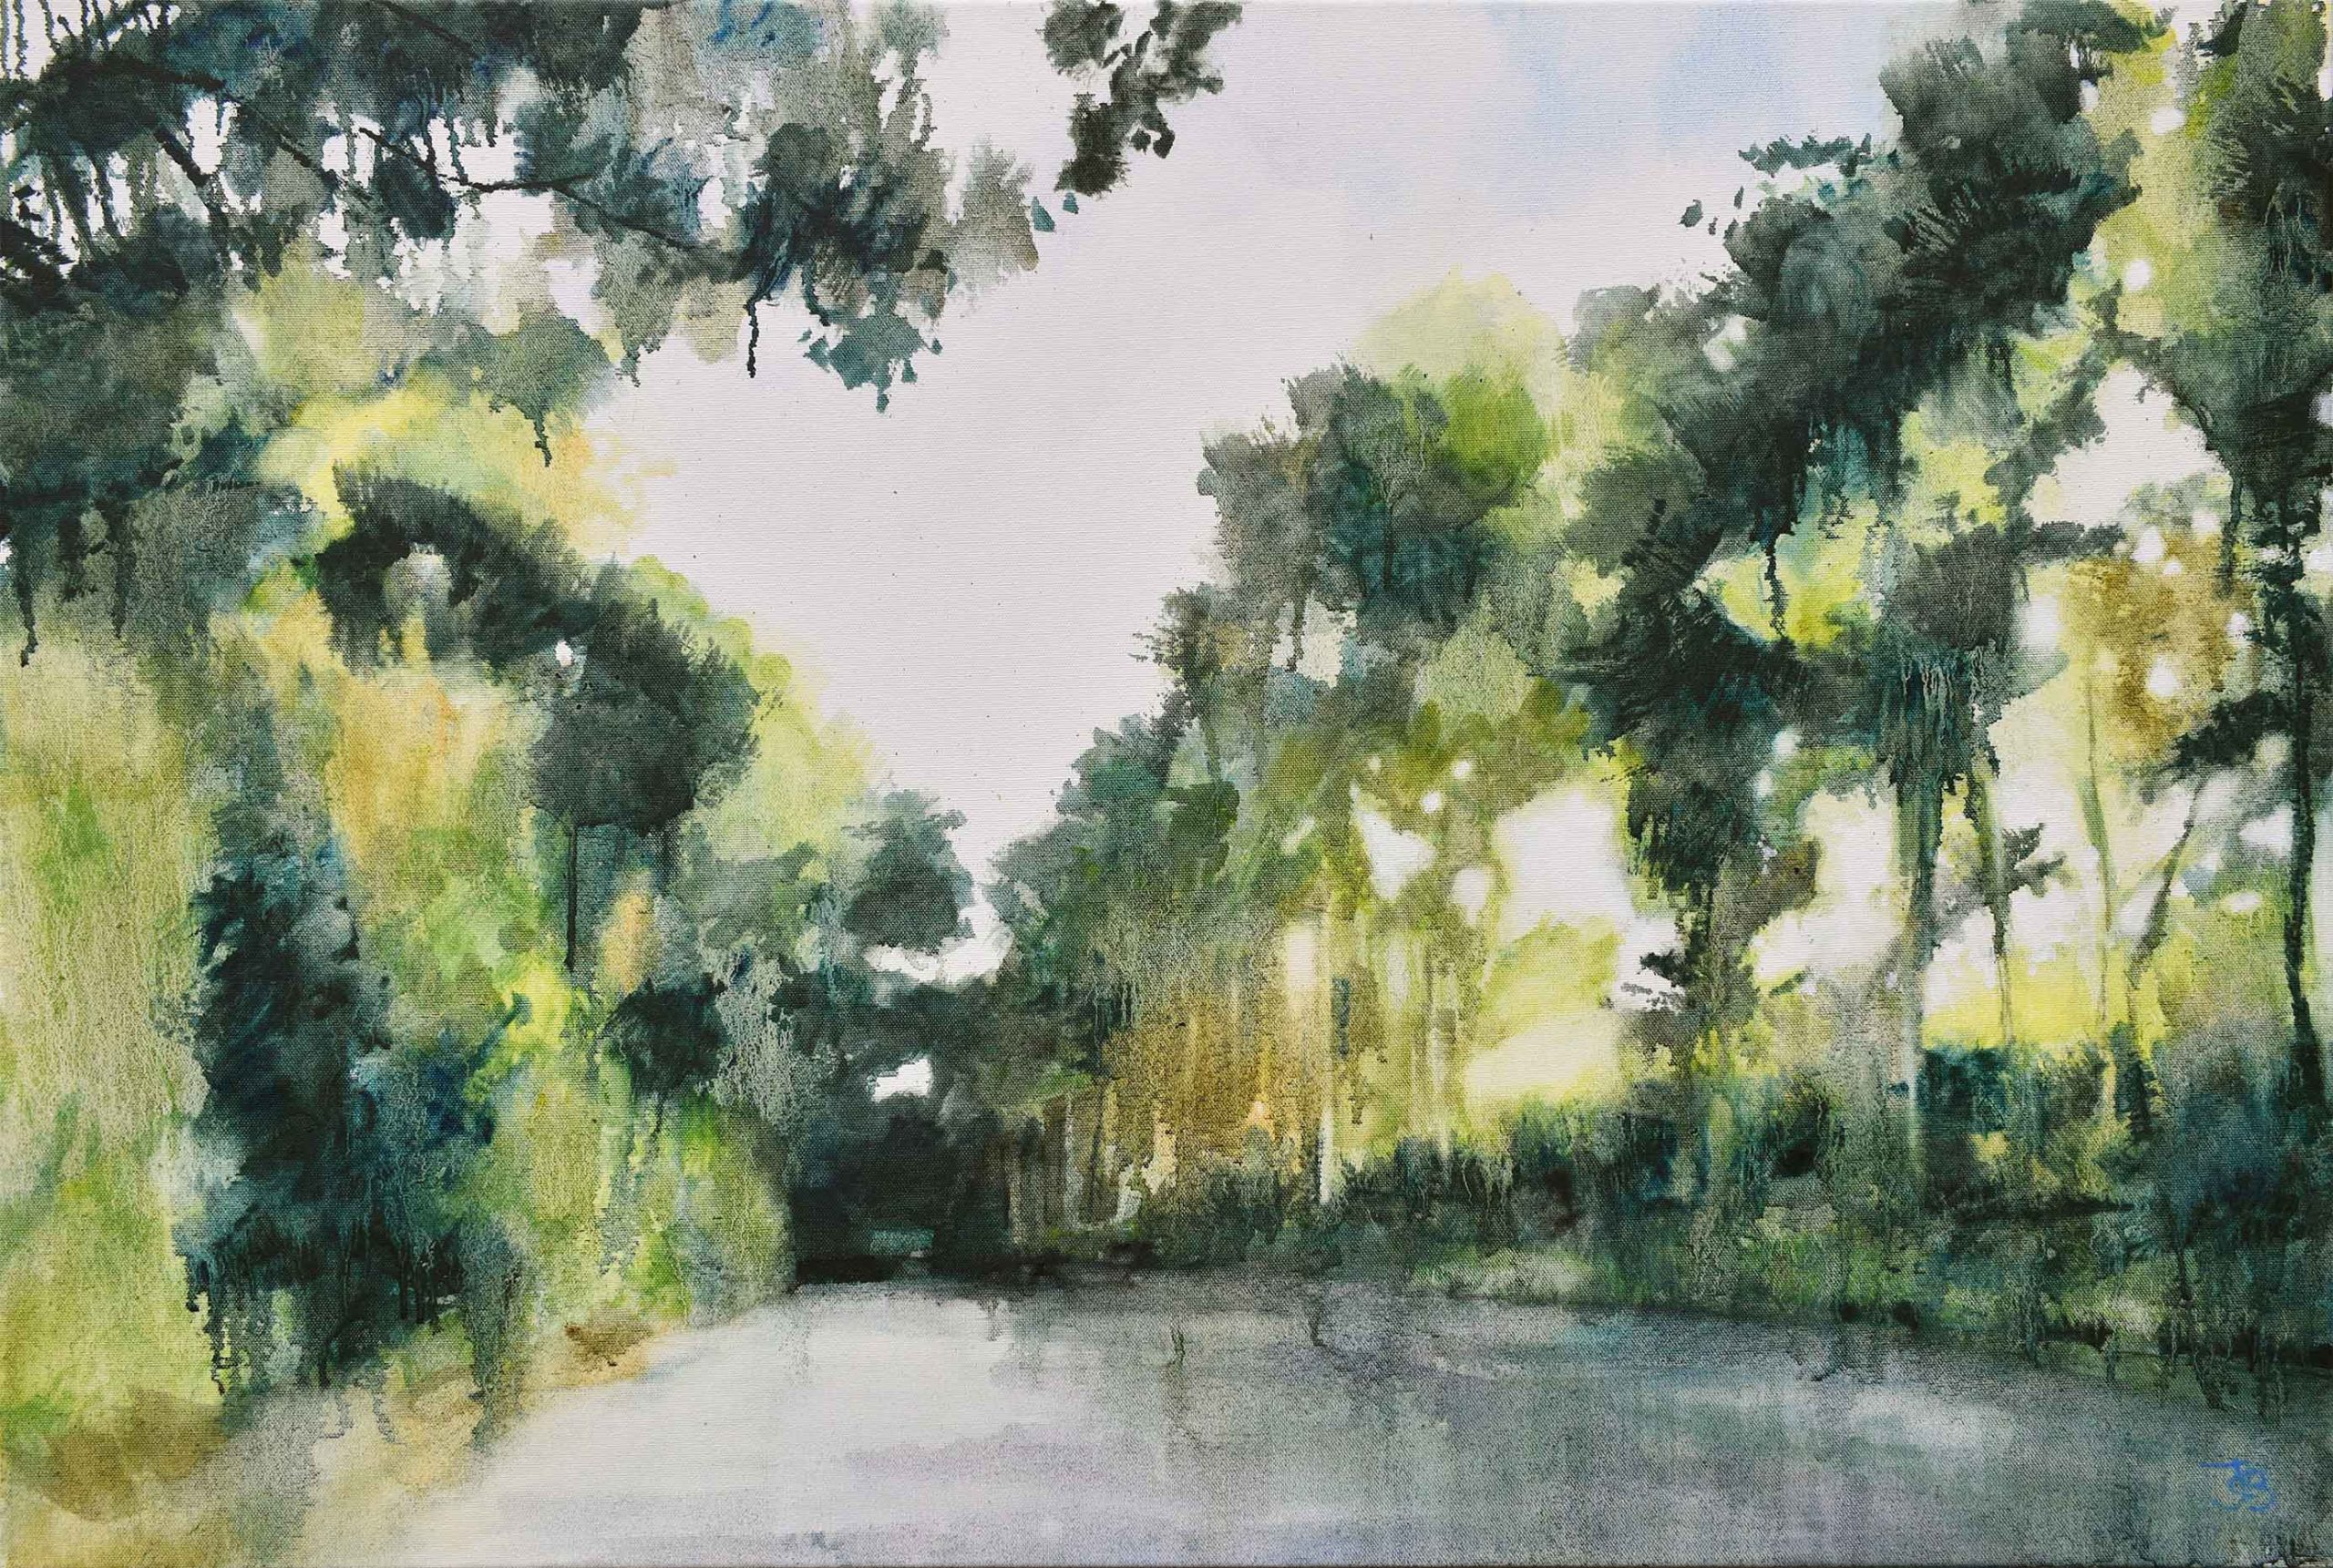 Flicker, 2020, Oil on canvas, 61 x 91.4cm | Julia Brown